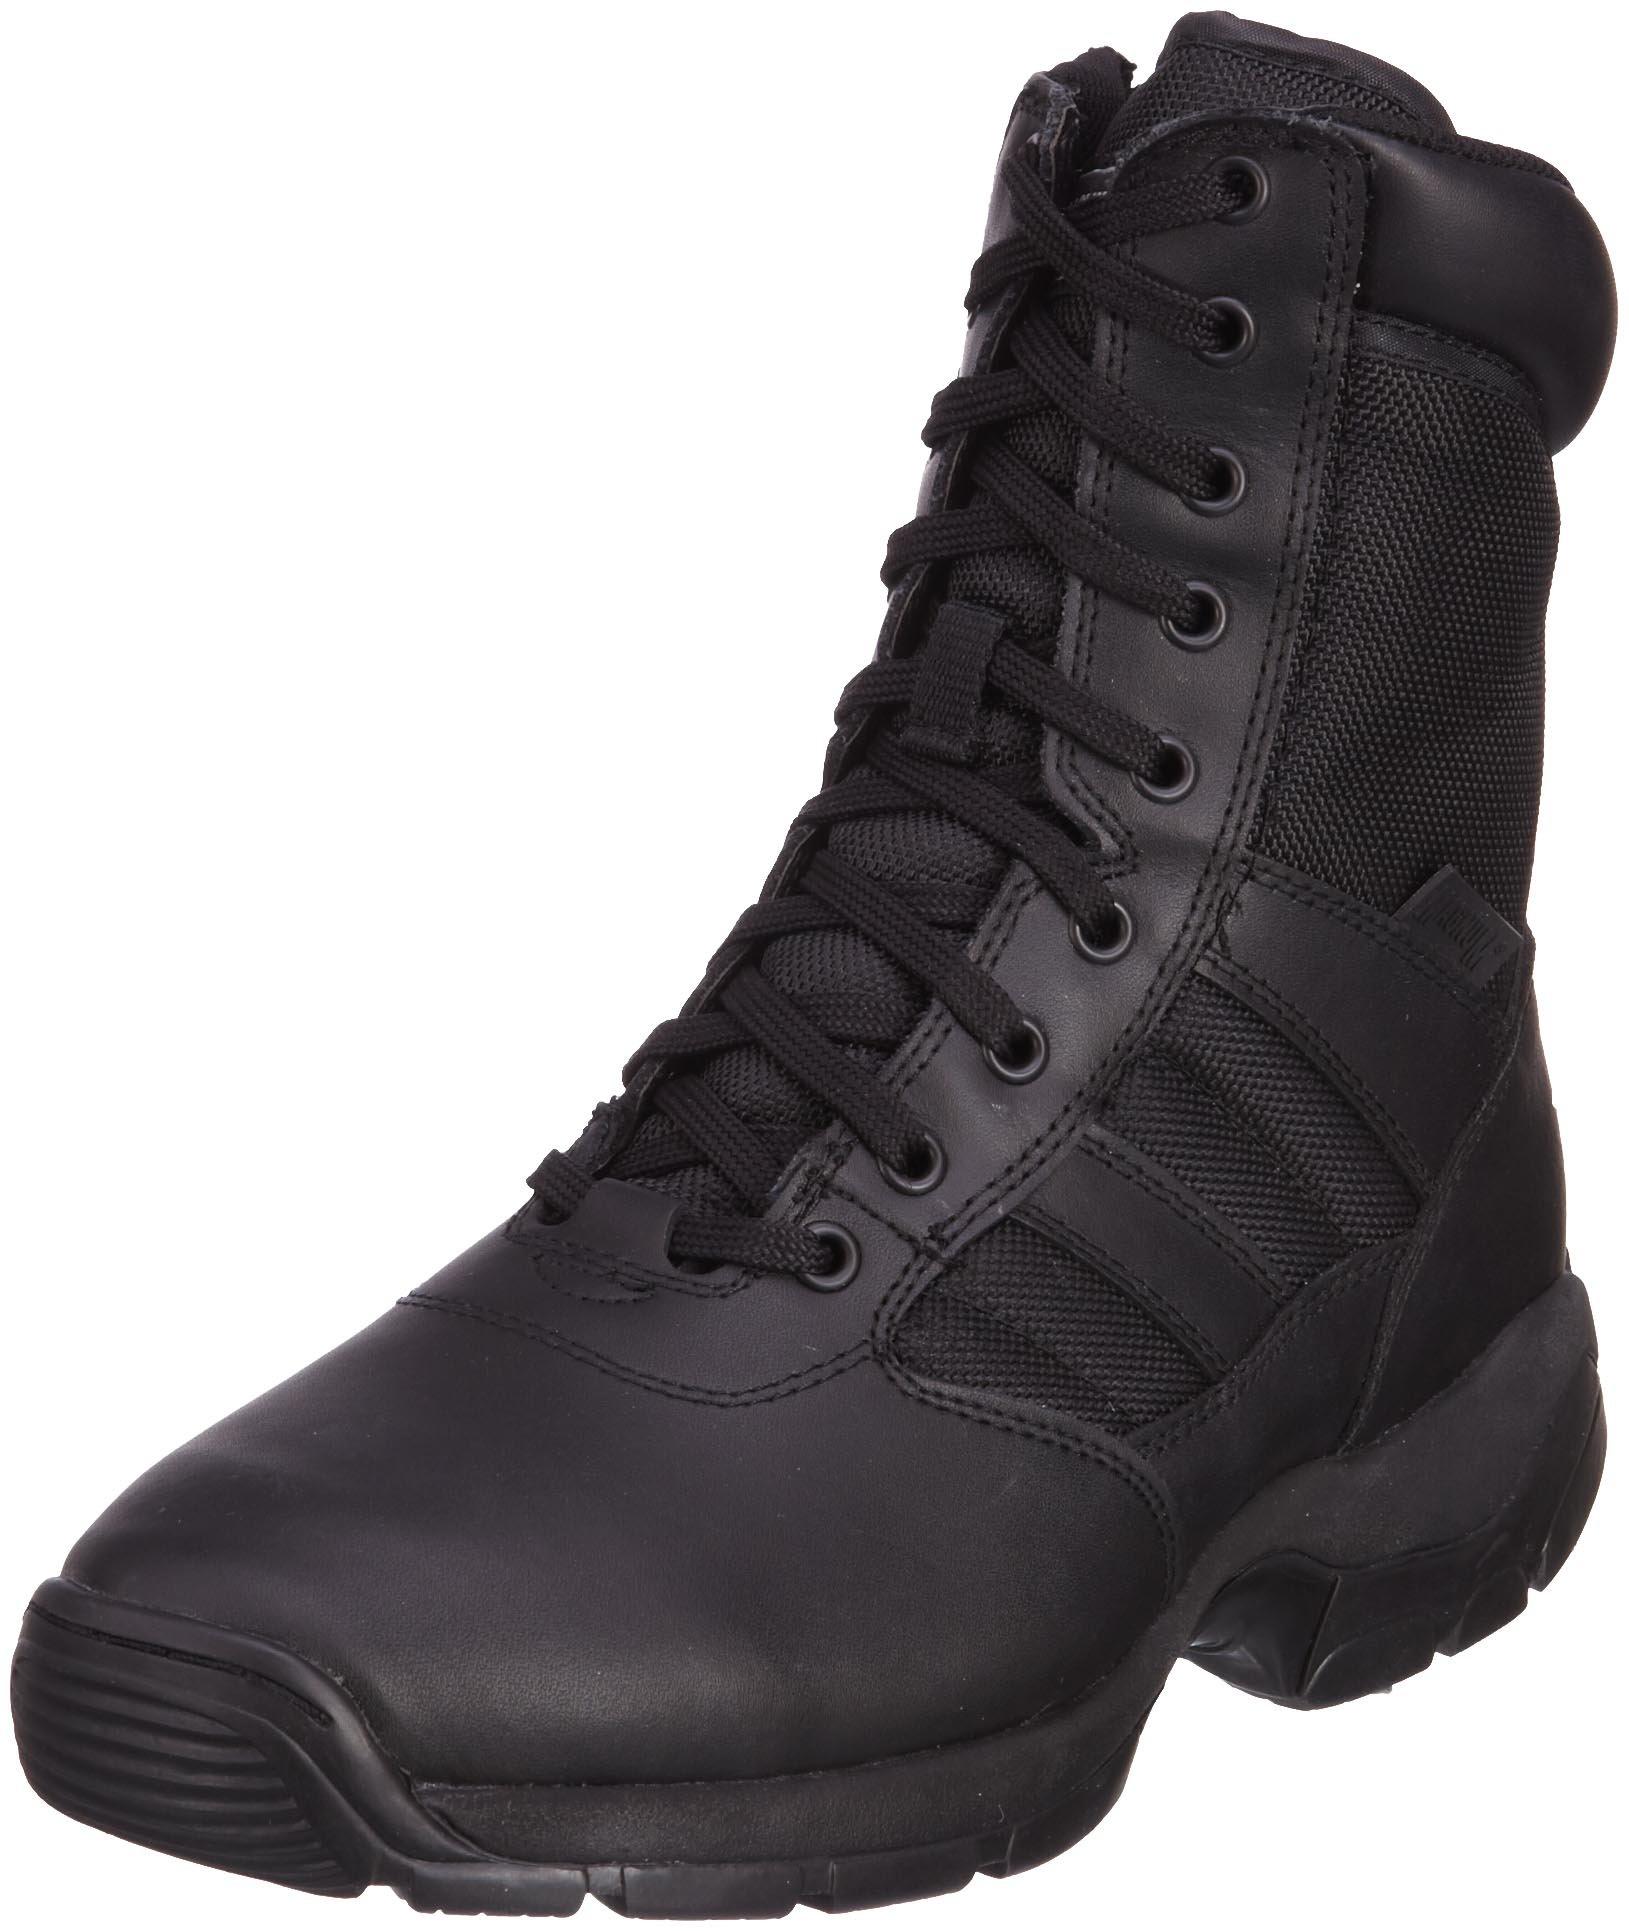 Magnum Panther 8.0 SZ Boots - 8 - Black